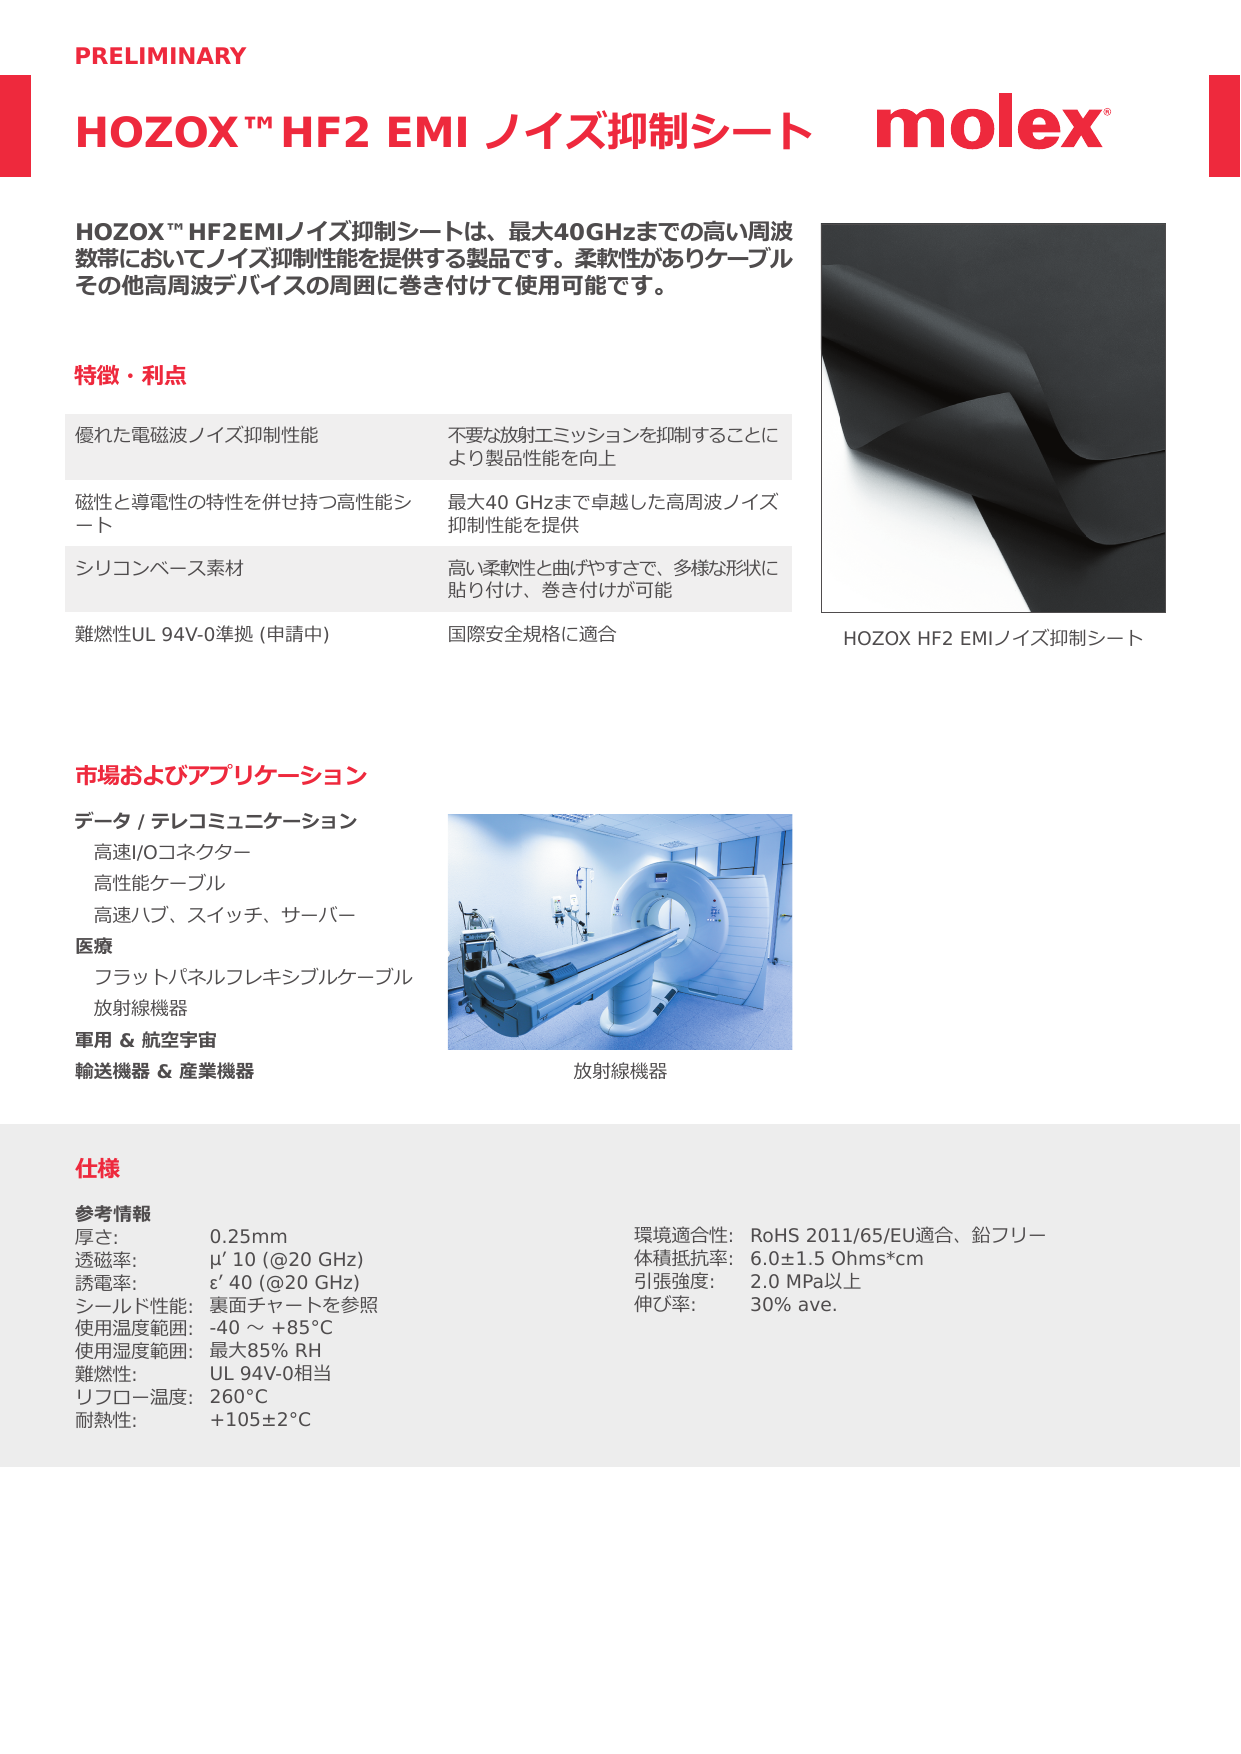 HOZOX(TM)HF2 EMI ノイズ抑制シート